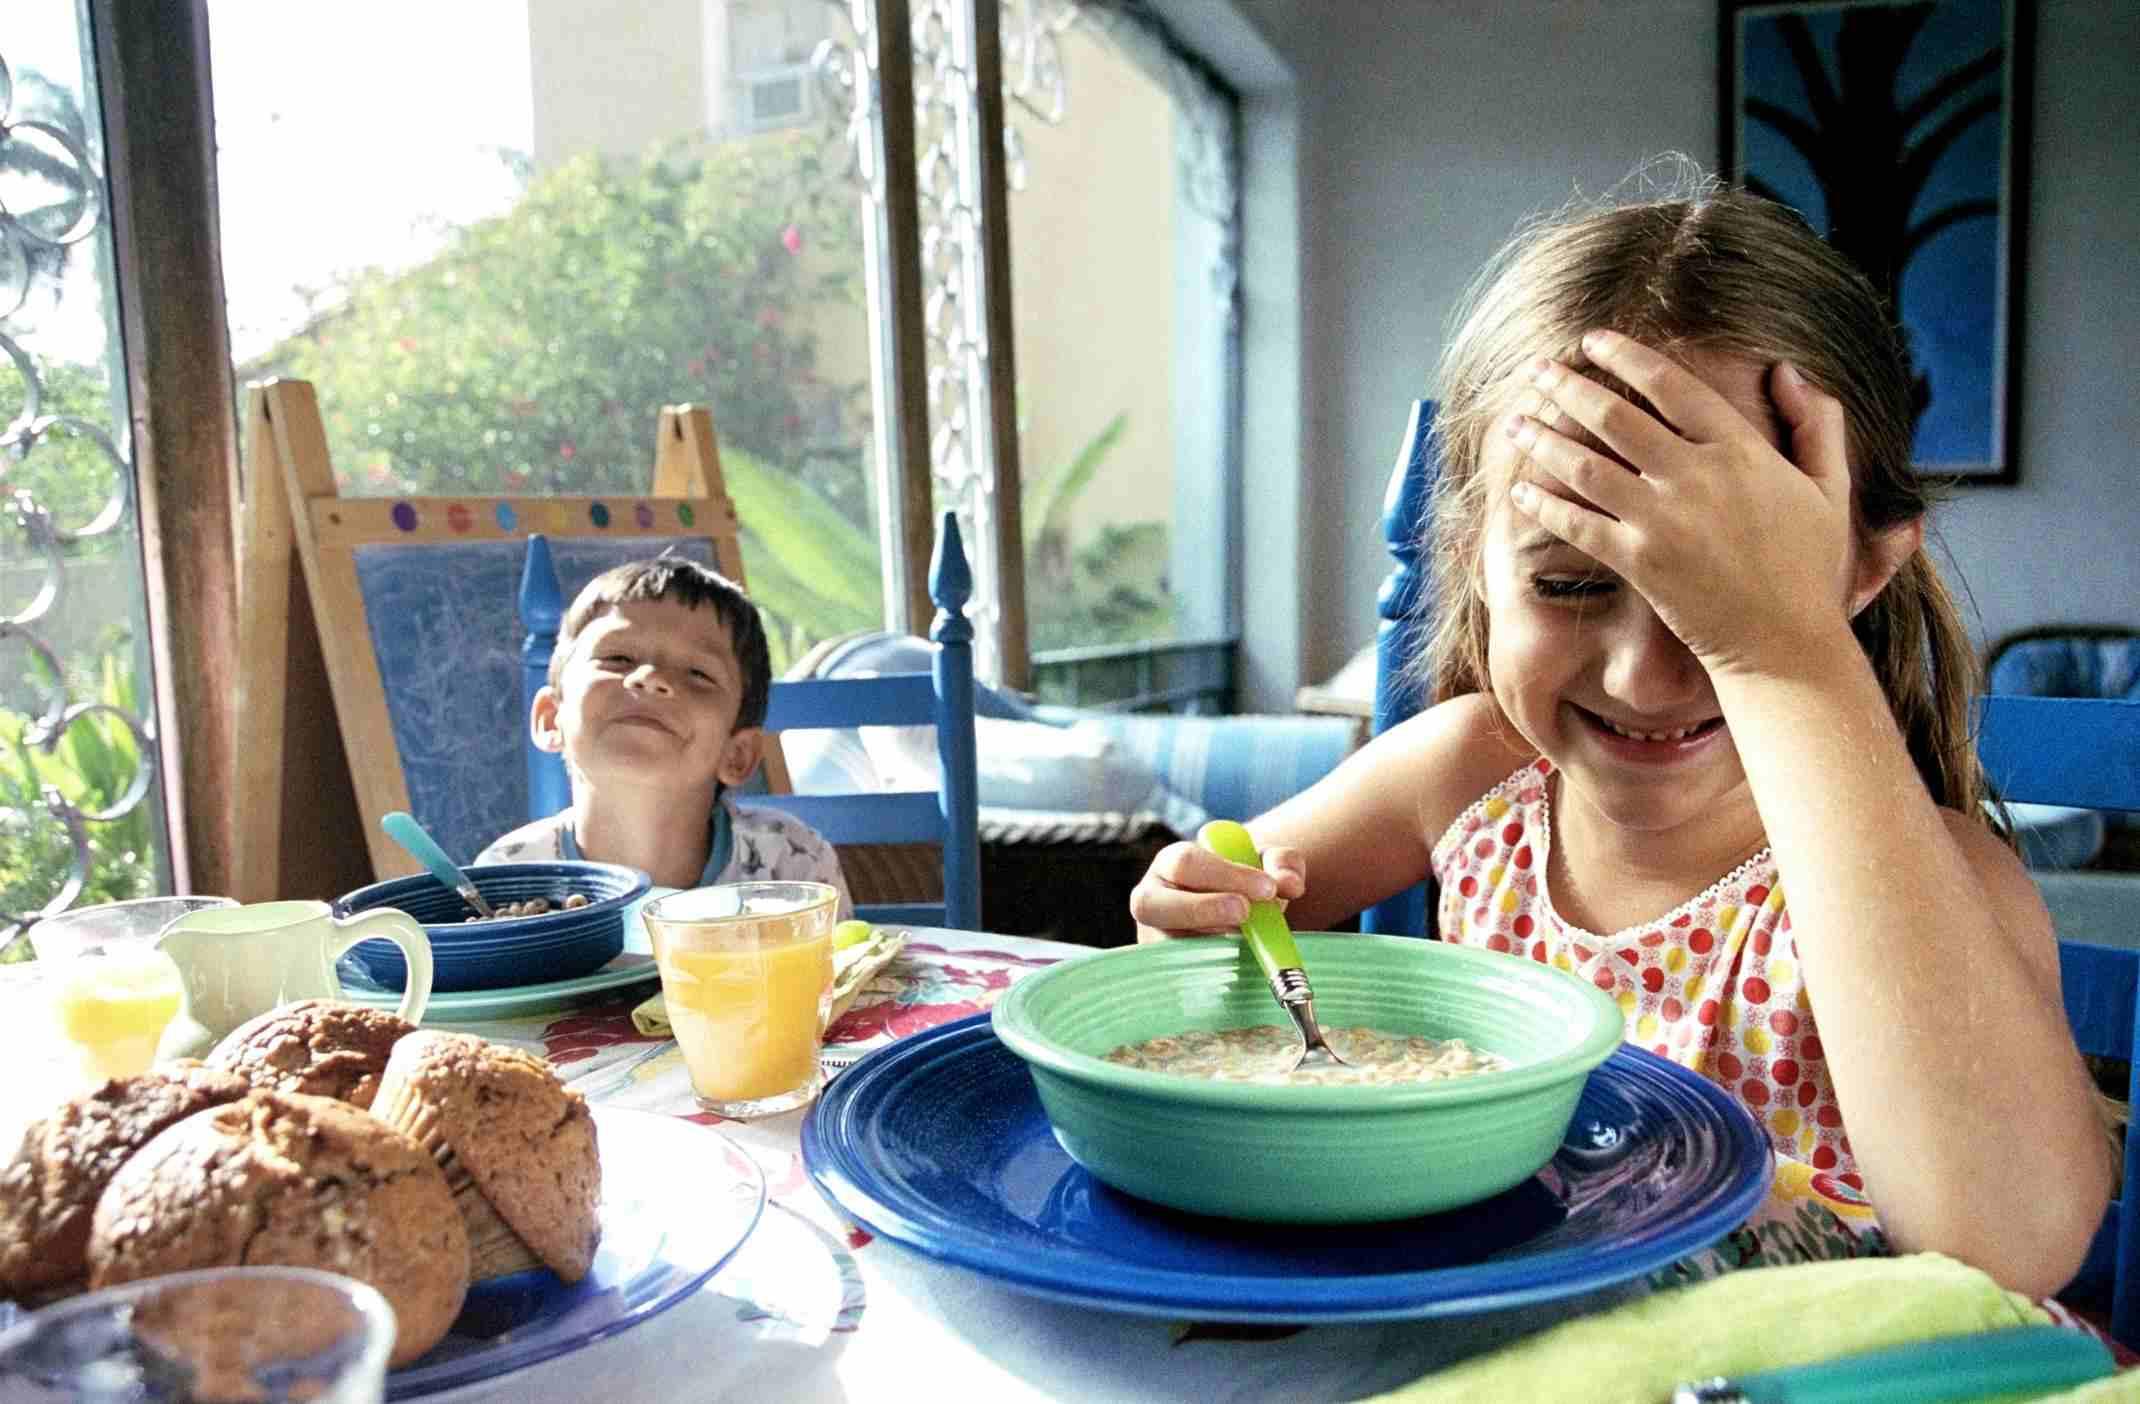 Children smiling at breakfast table